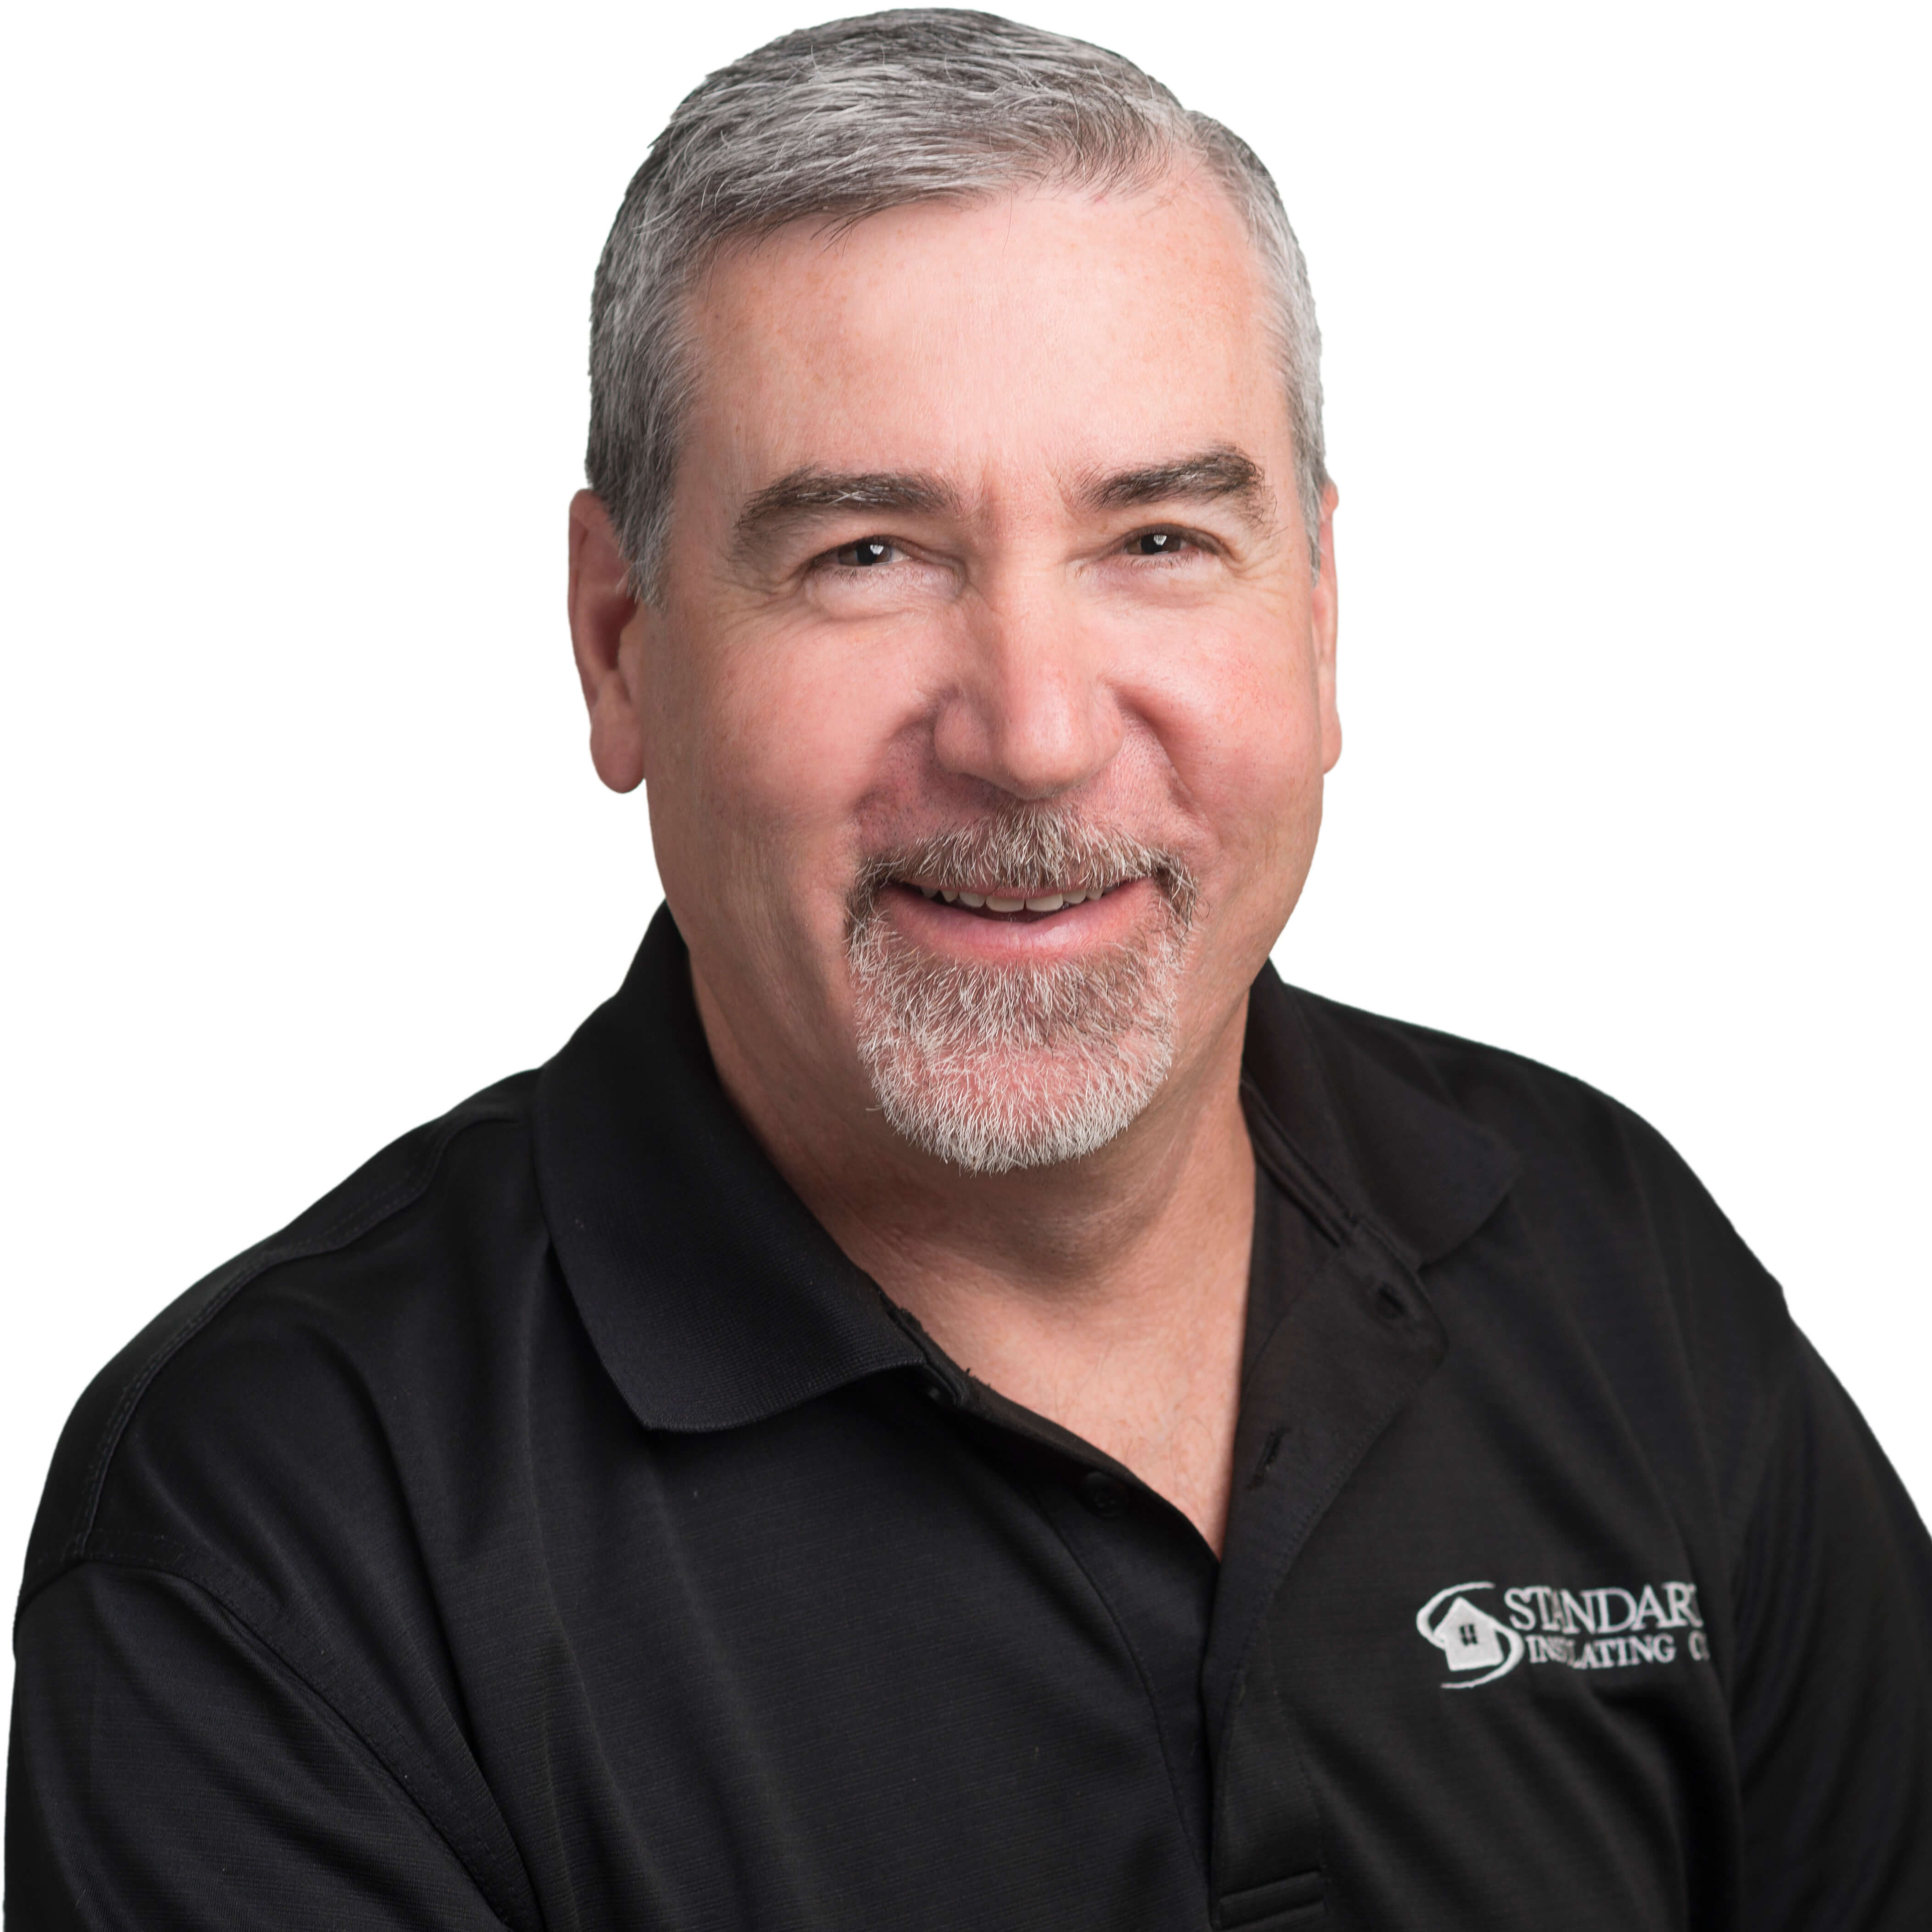 Kevin Homer standard insulating co